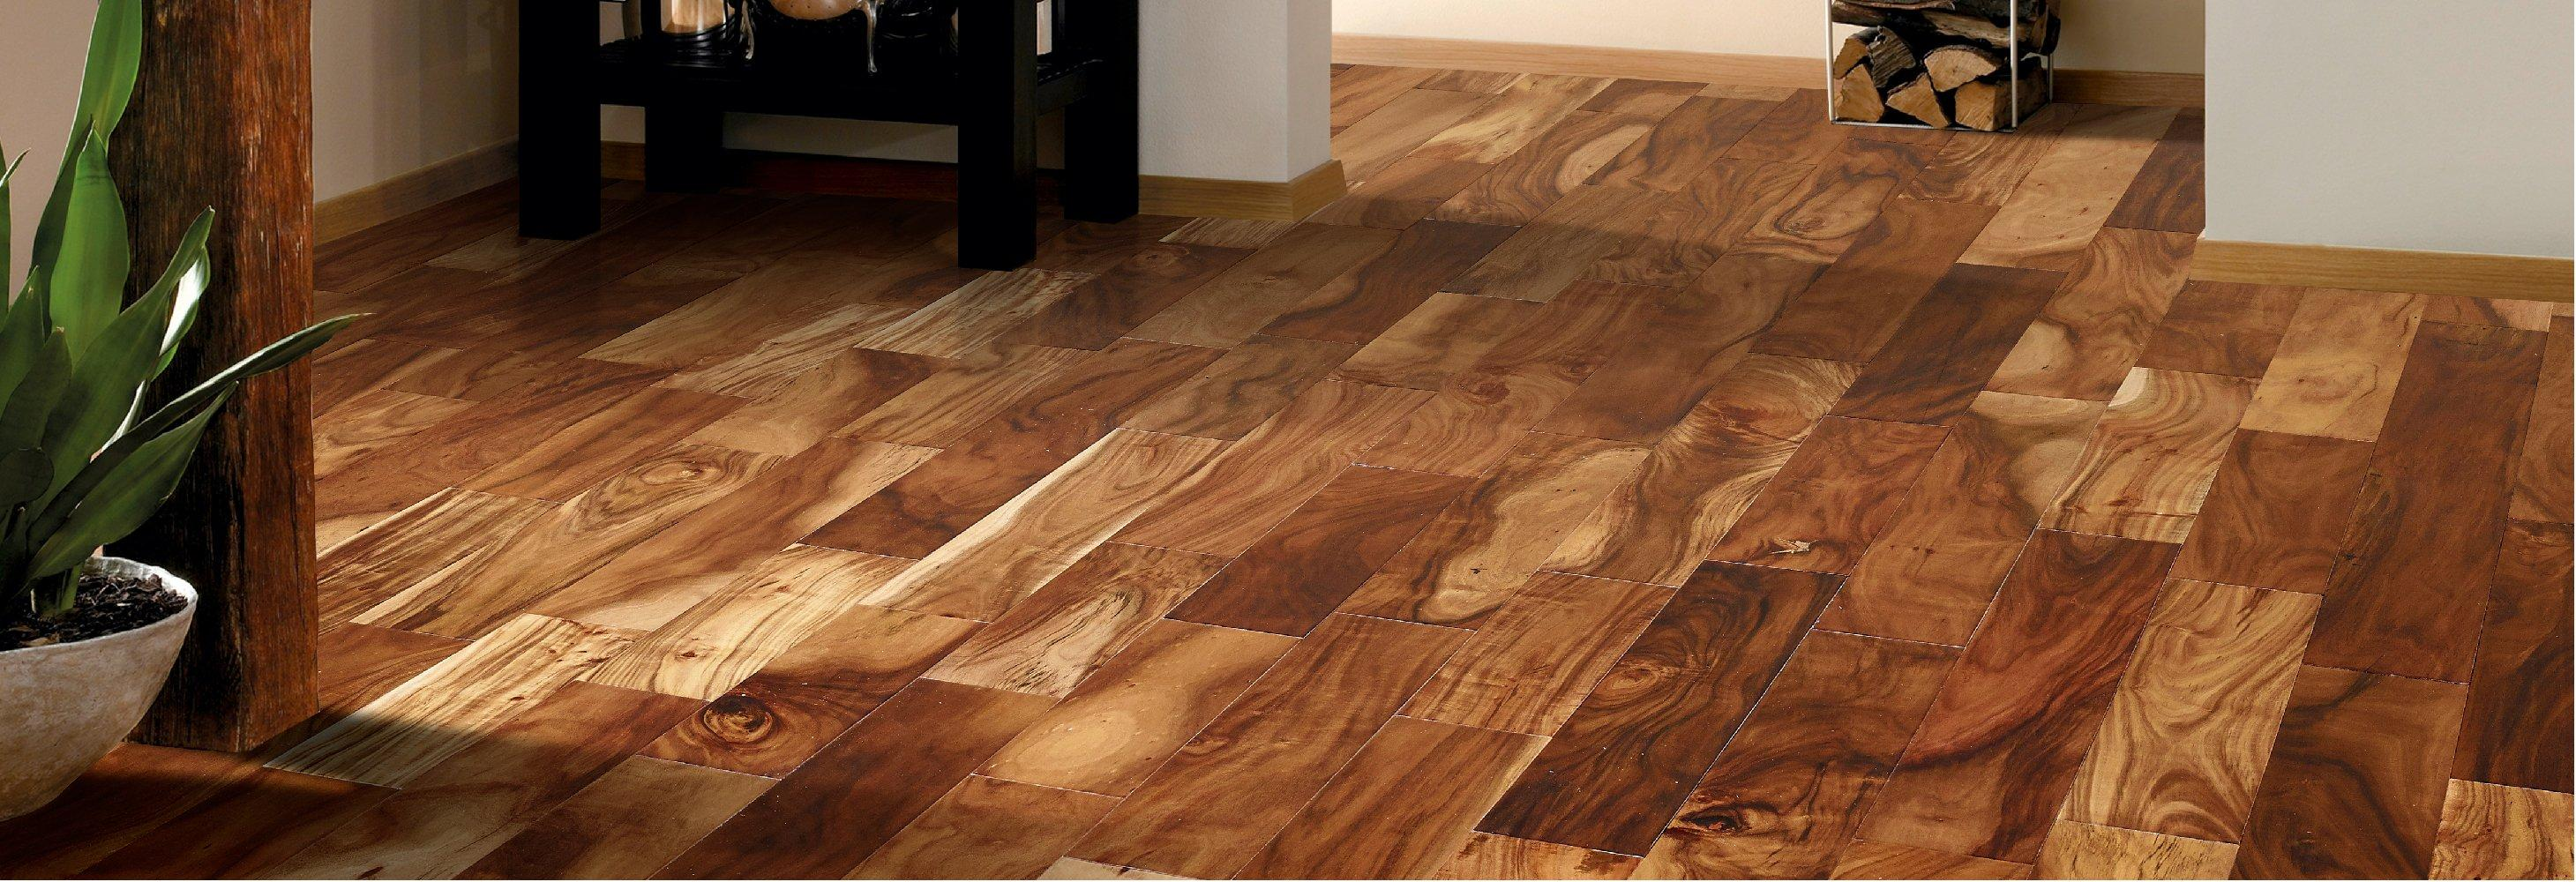 engineered hardwood floors engineered hardwood flooring IOIKIXX